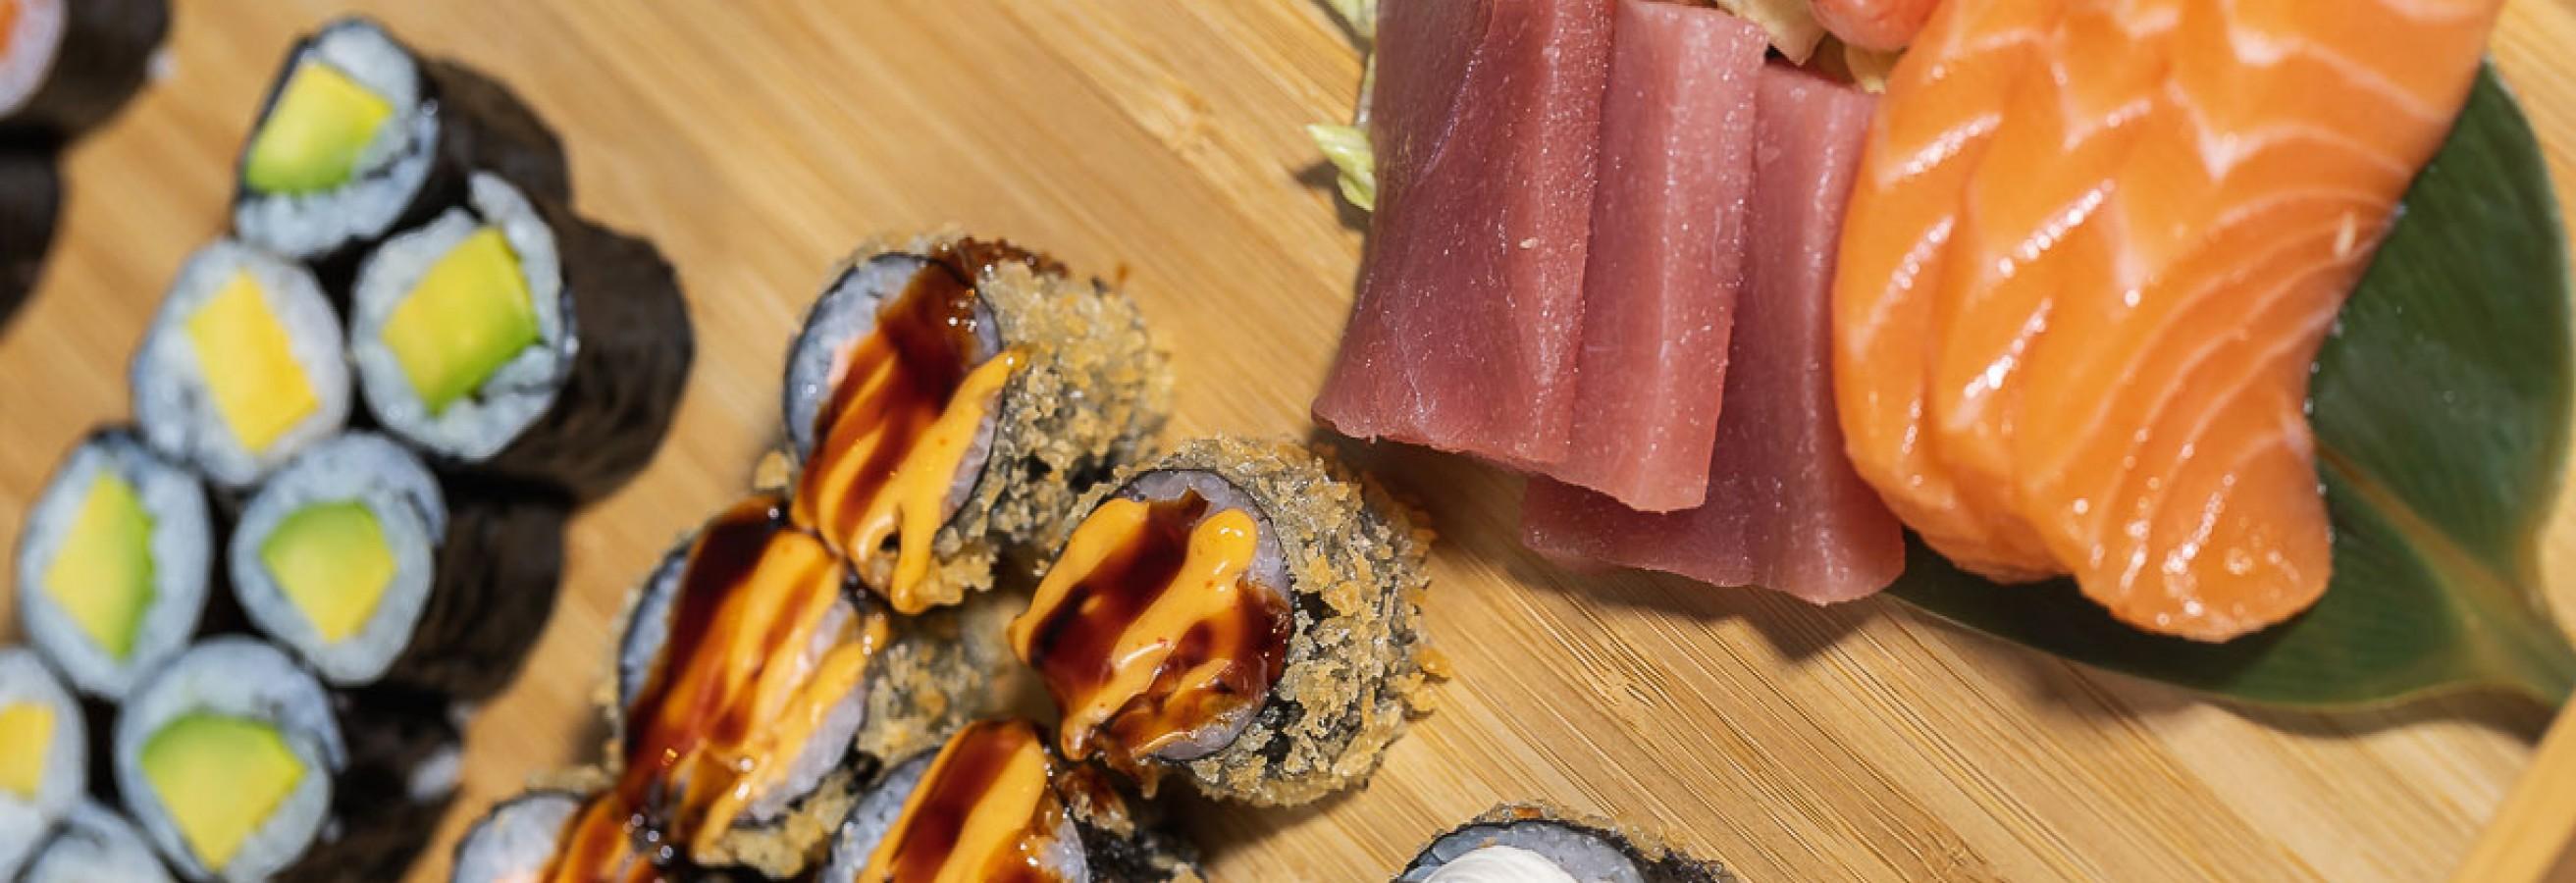 Dama Sushi & Poke - Gourmet - Tor Vergata - Romanina